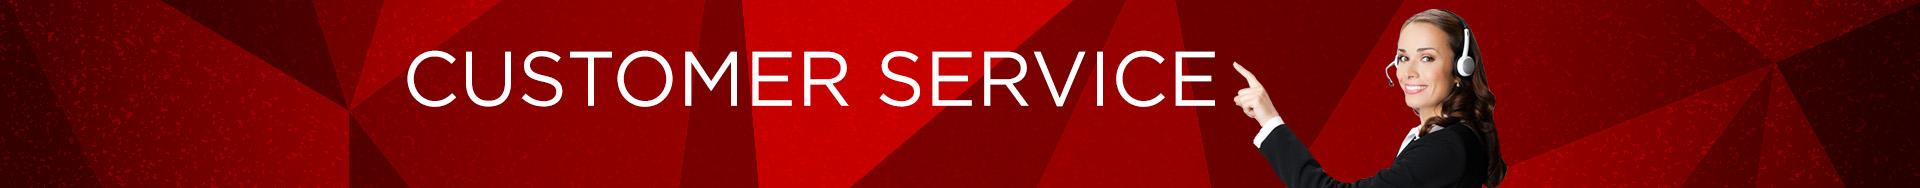 Customer Service, JackysElectronics.com